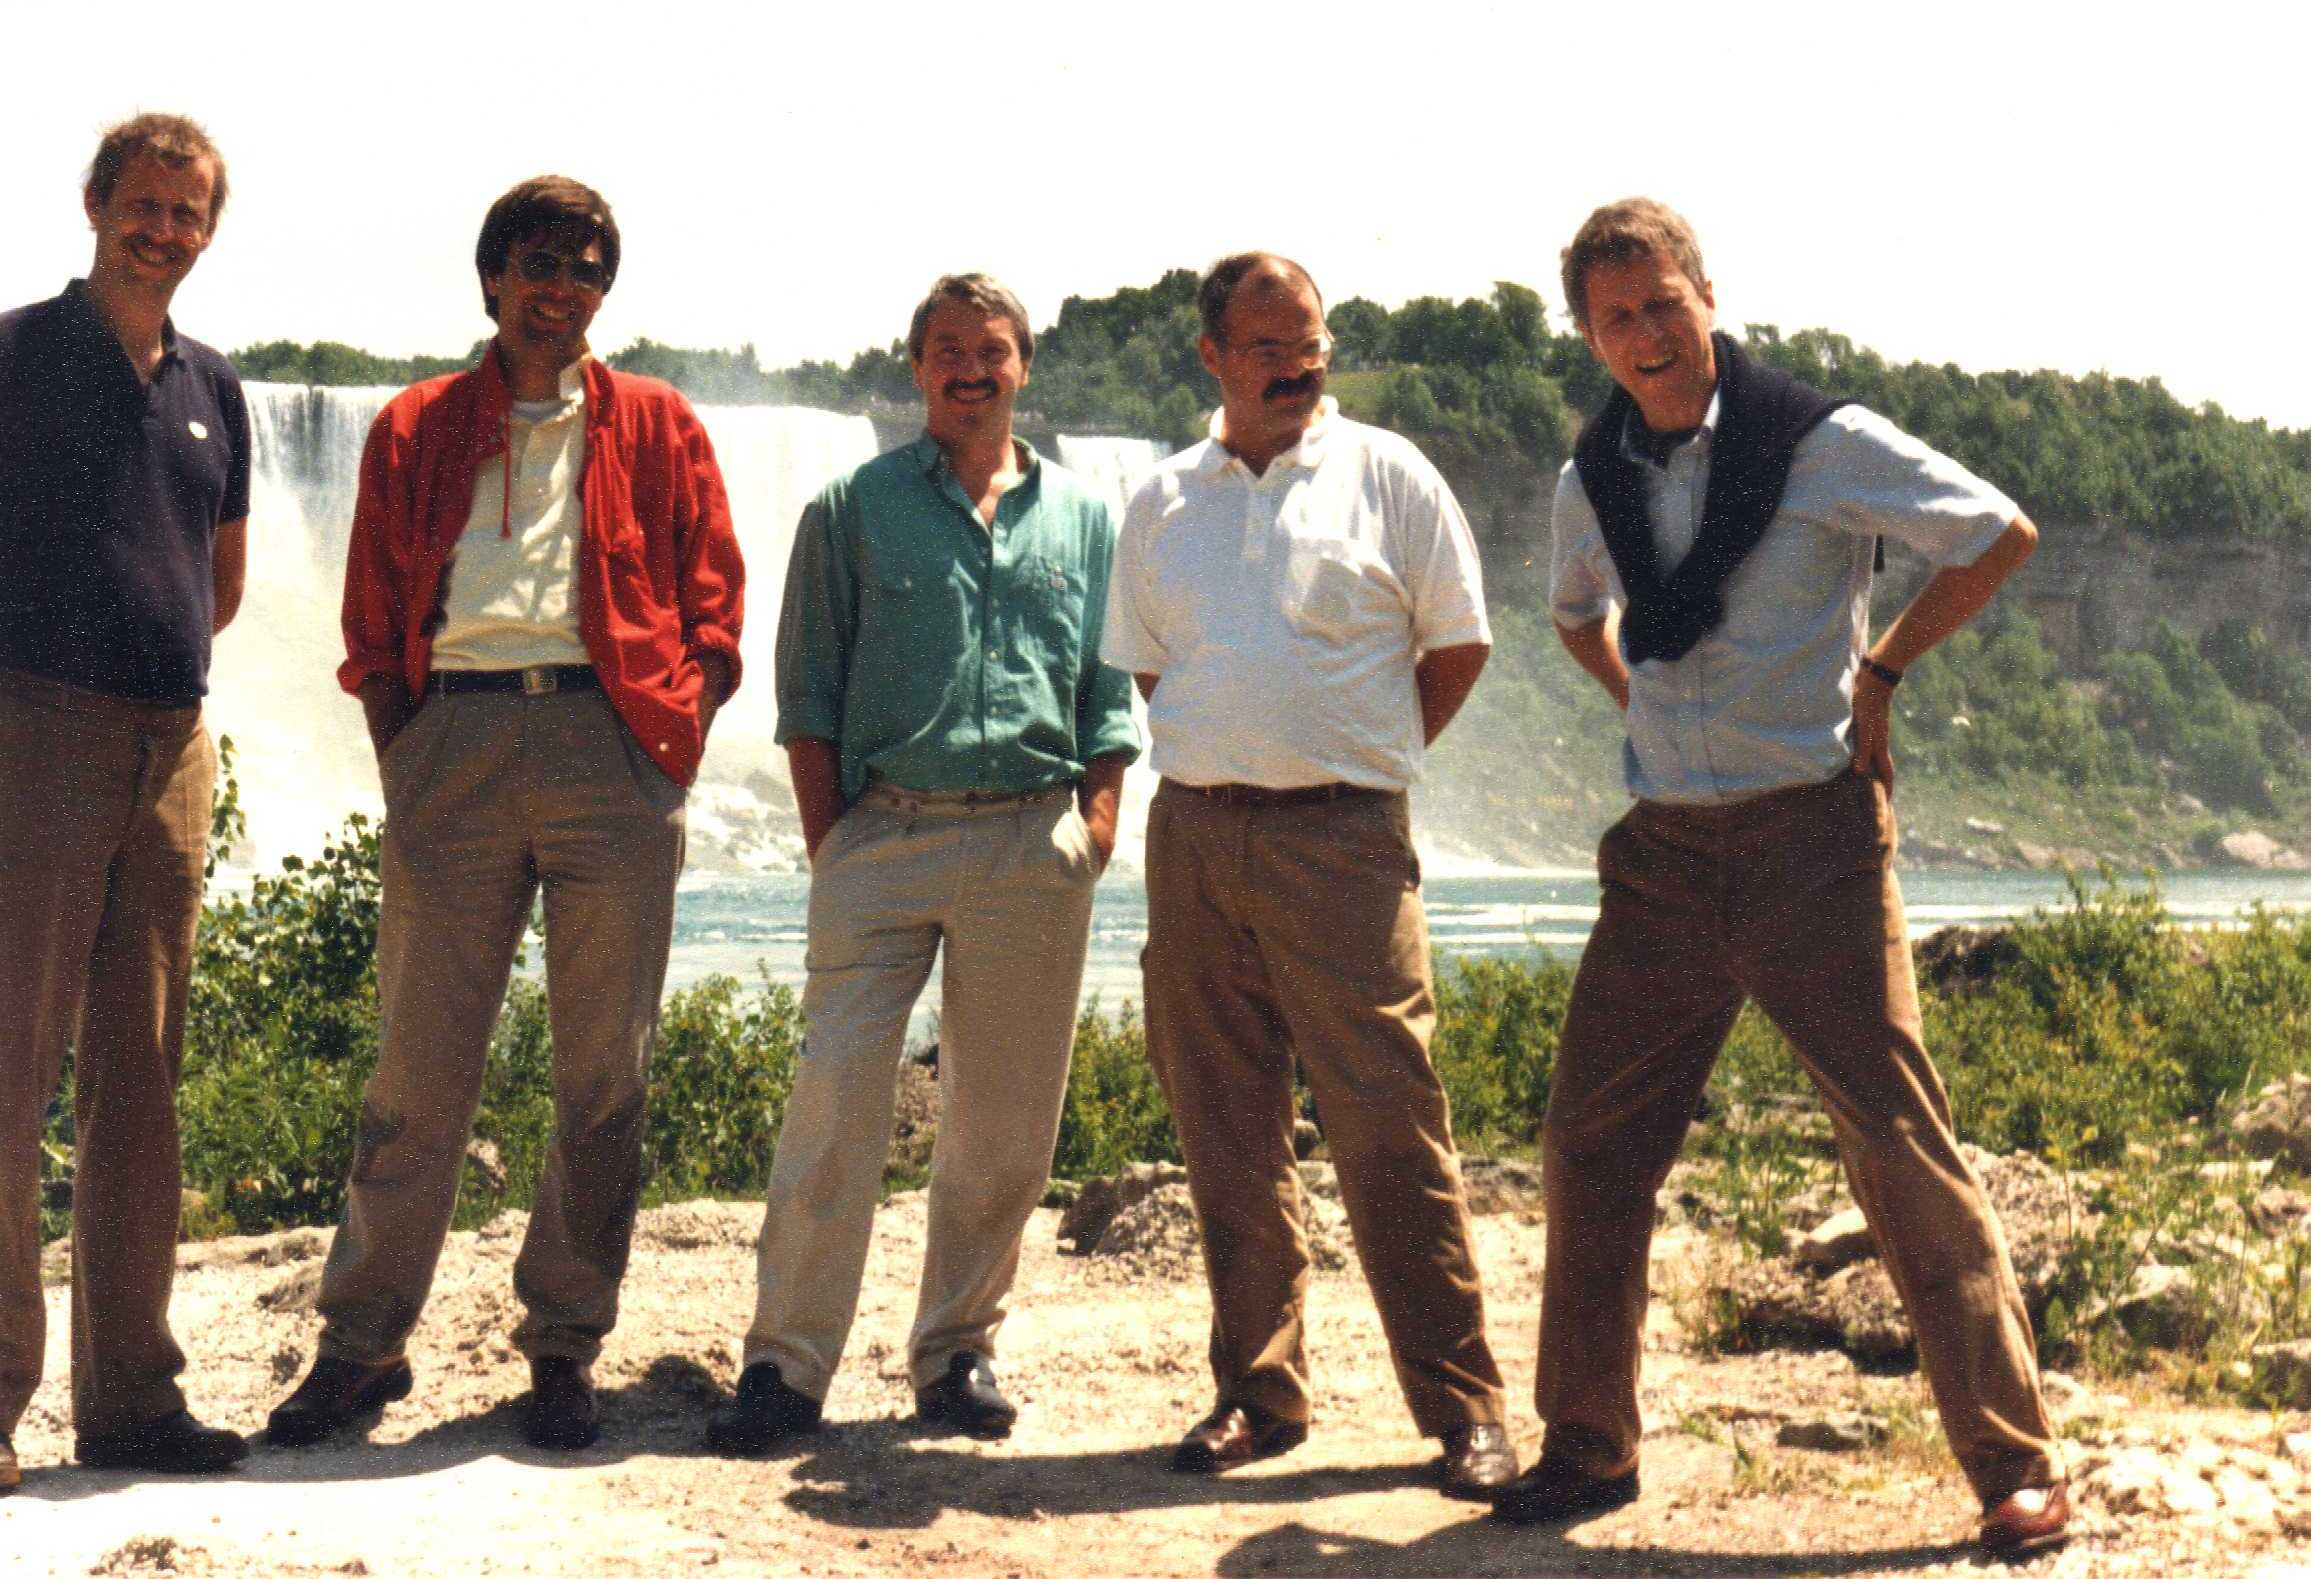 Niagara and Mayo Clinics 1989 Max Taks e.a.